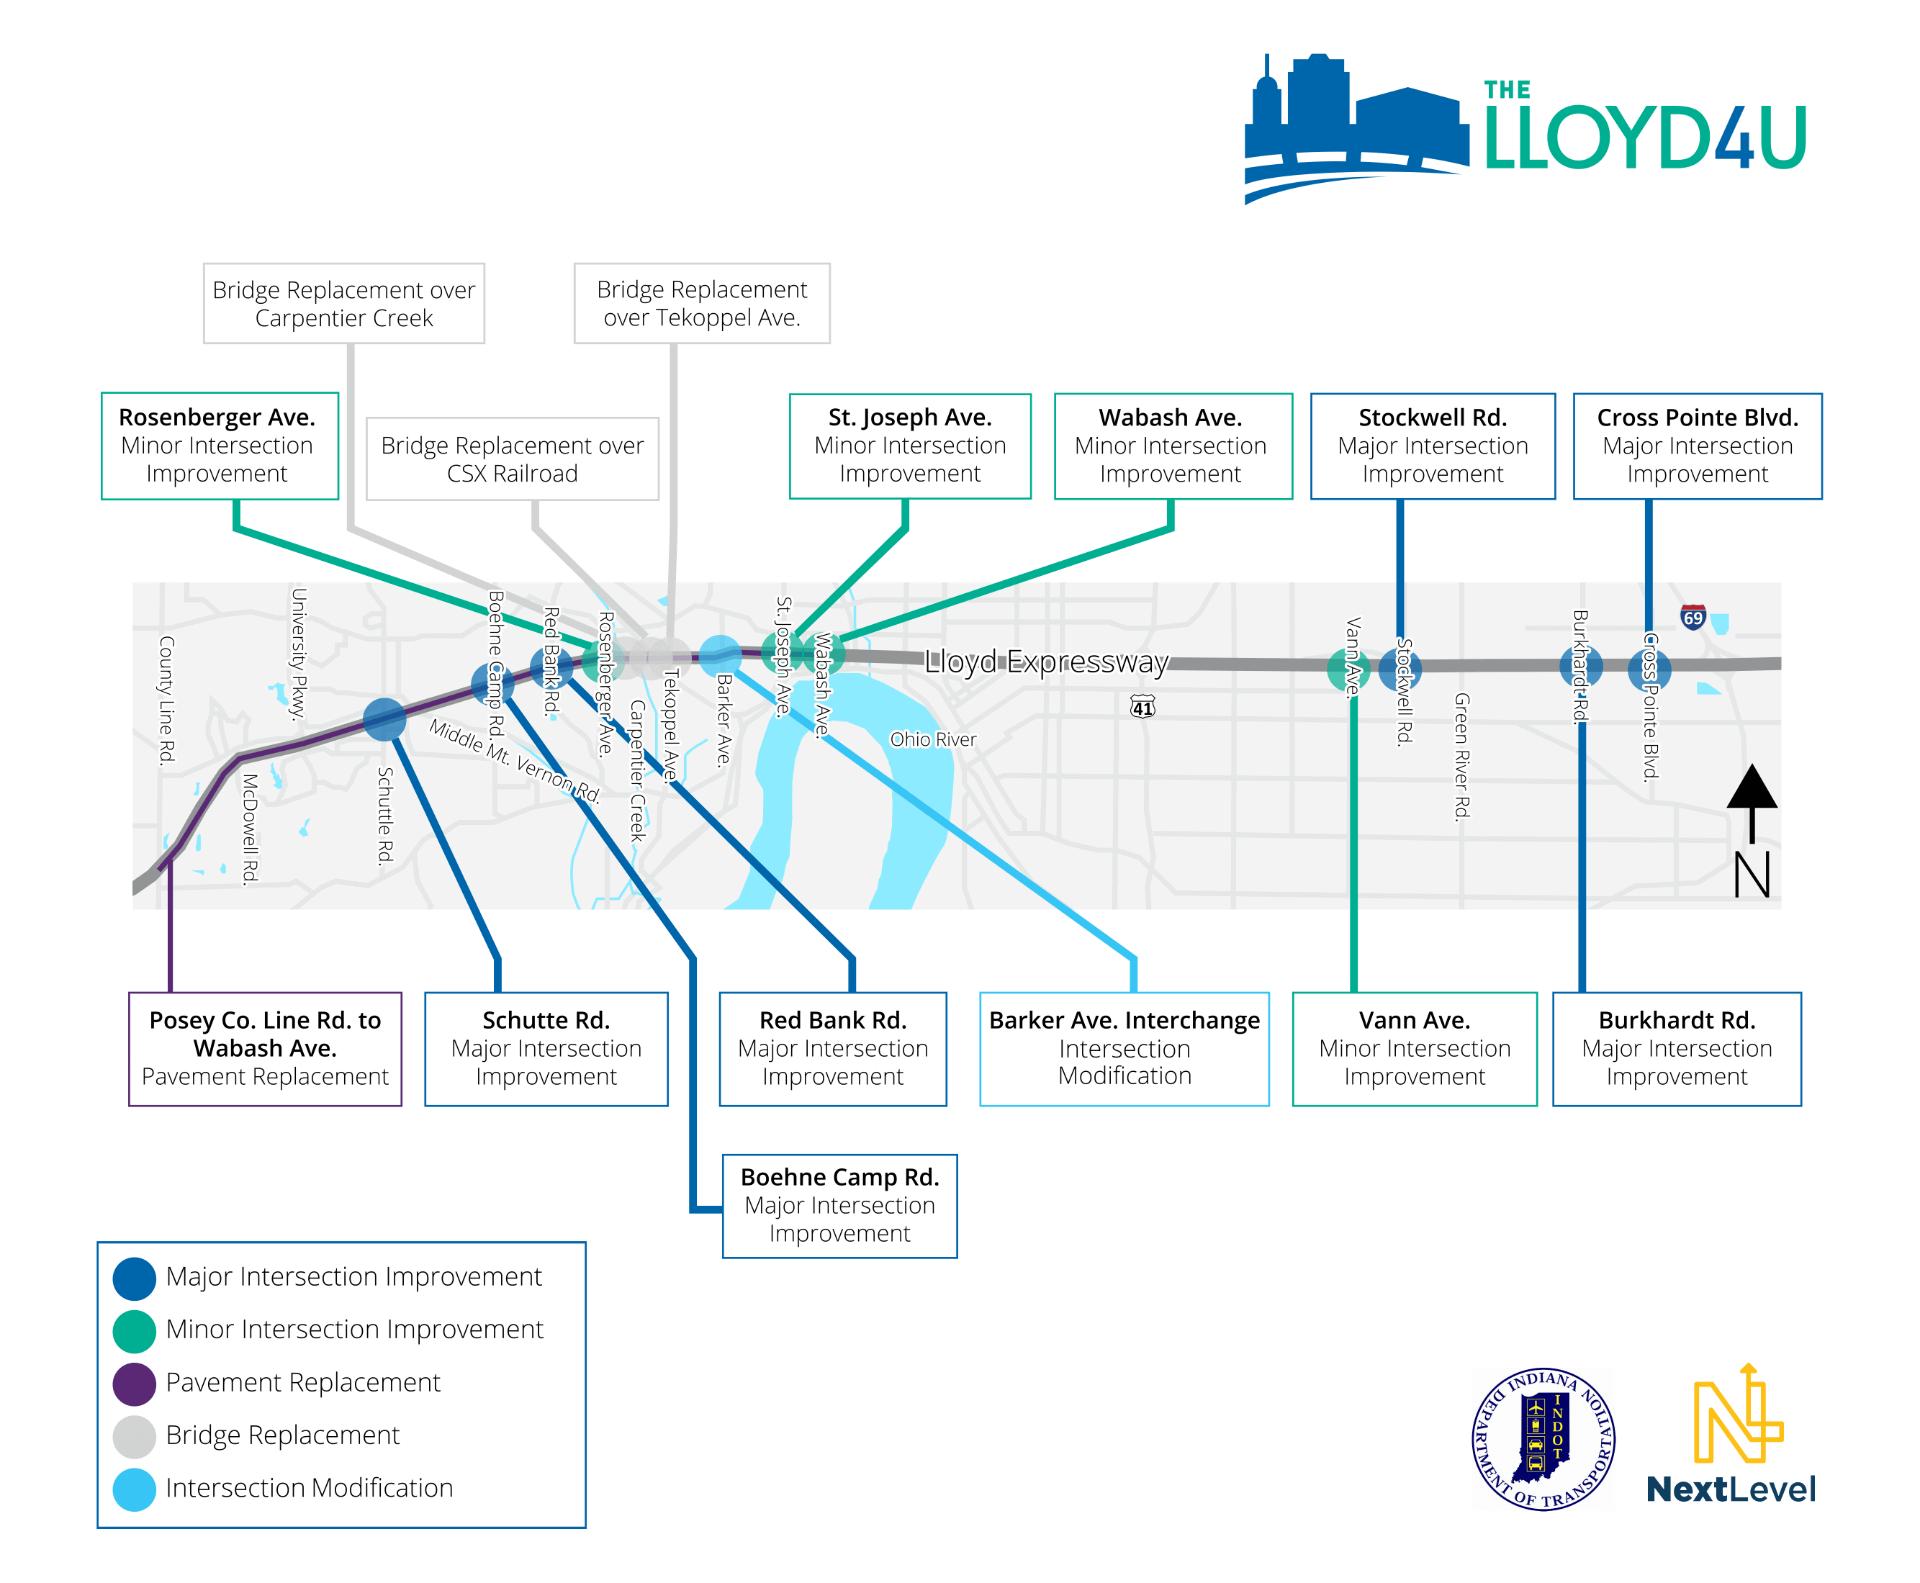 Lloyd Expressway Corridor Map